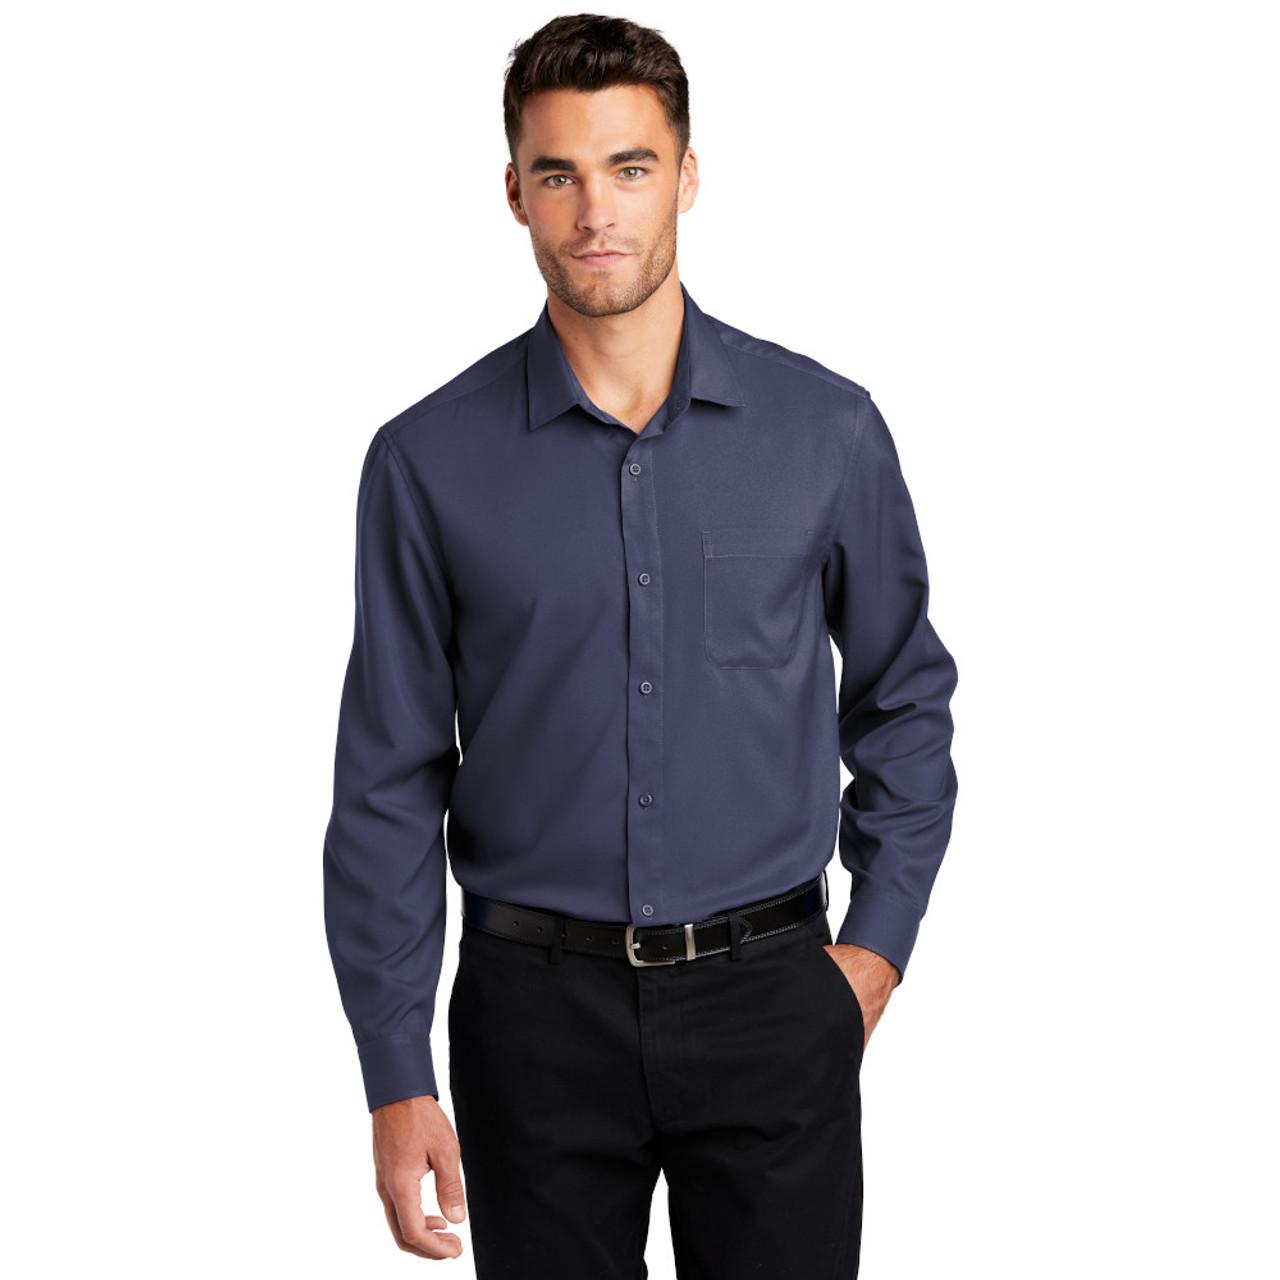 Men's Long Sleeve Performance Staff Shirt